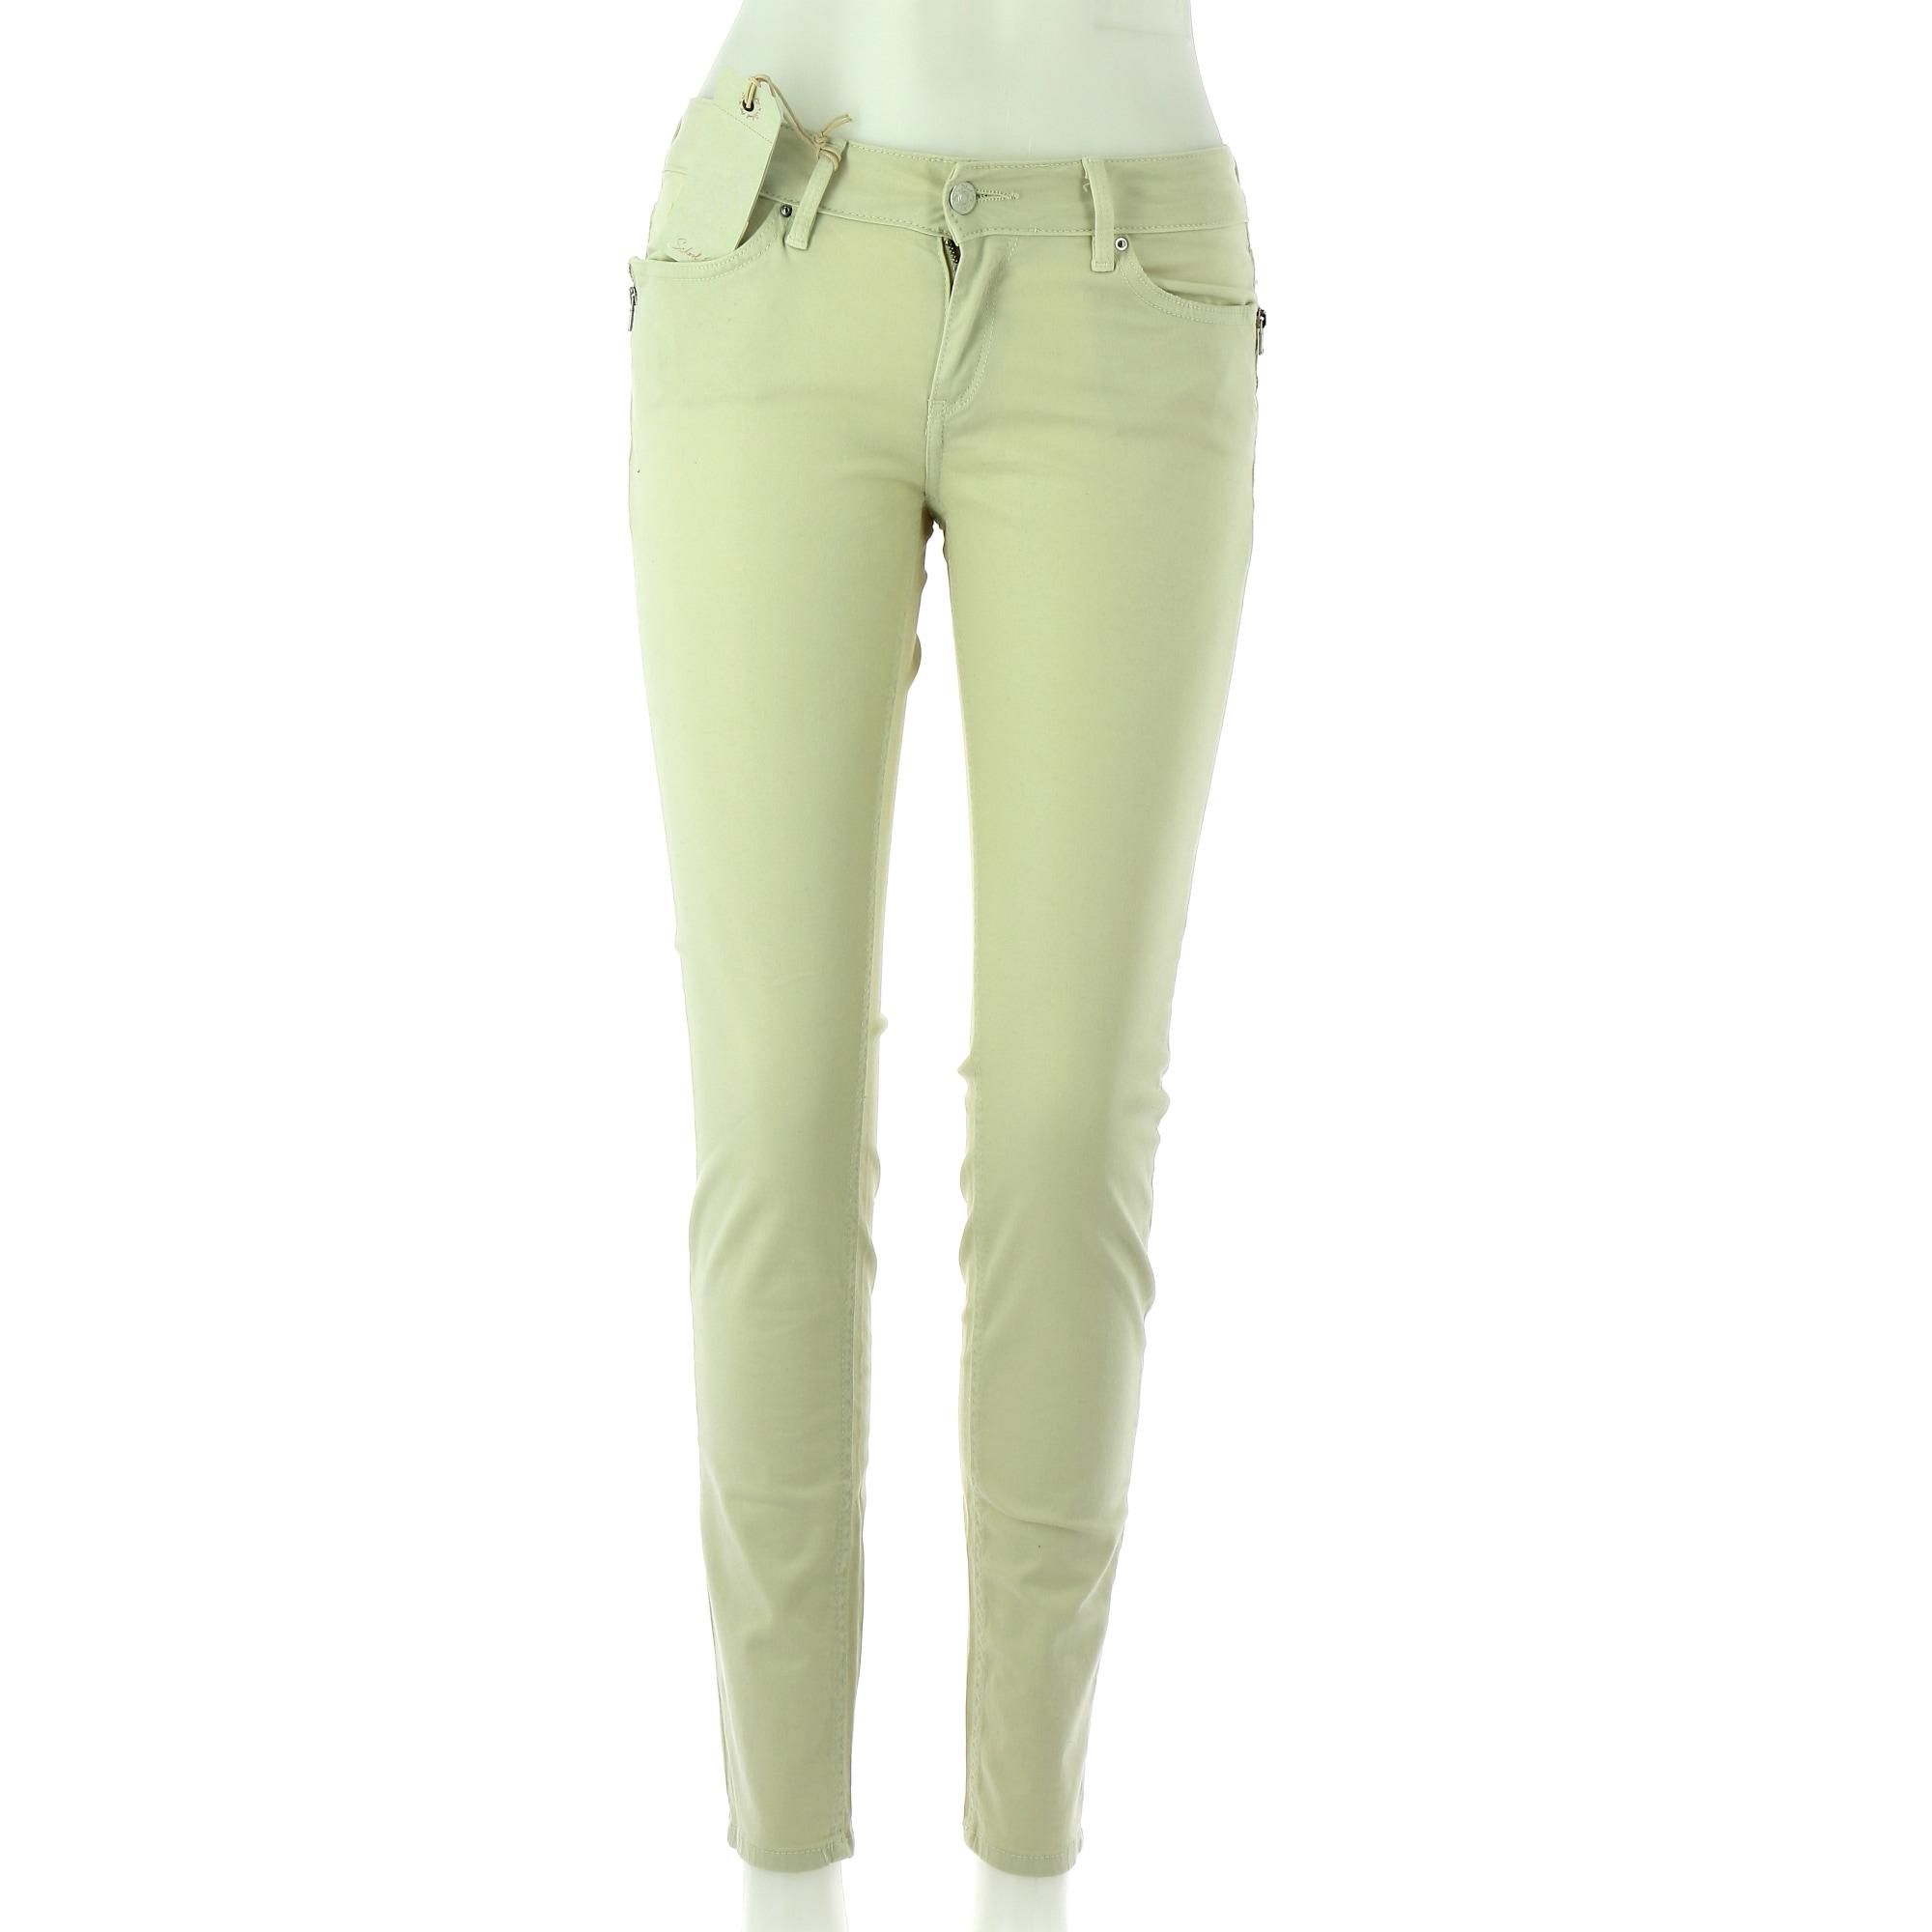 Straight-Cut Jeans  SCHOOL RAG Beige